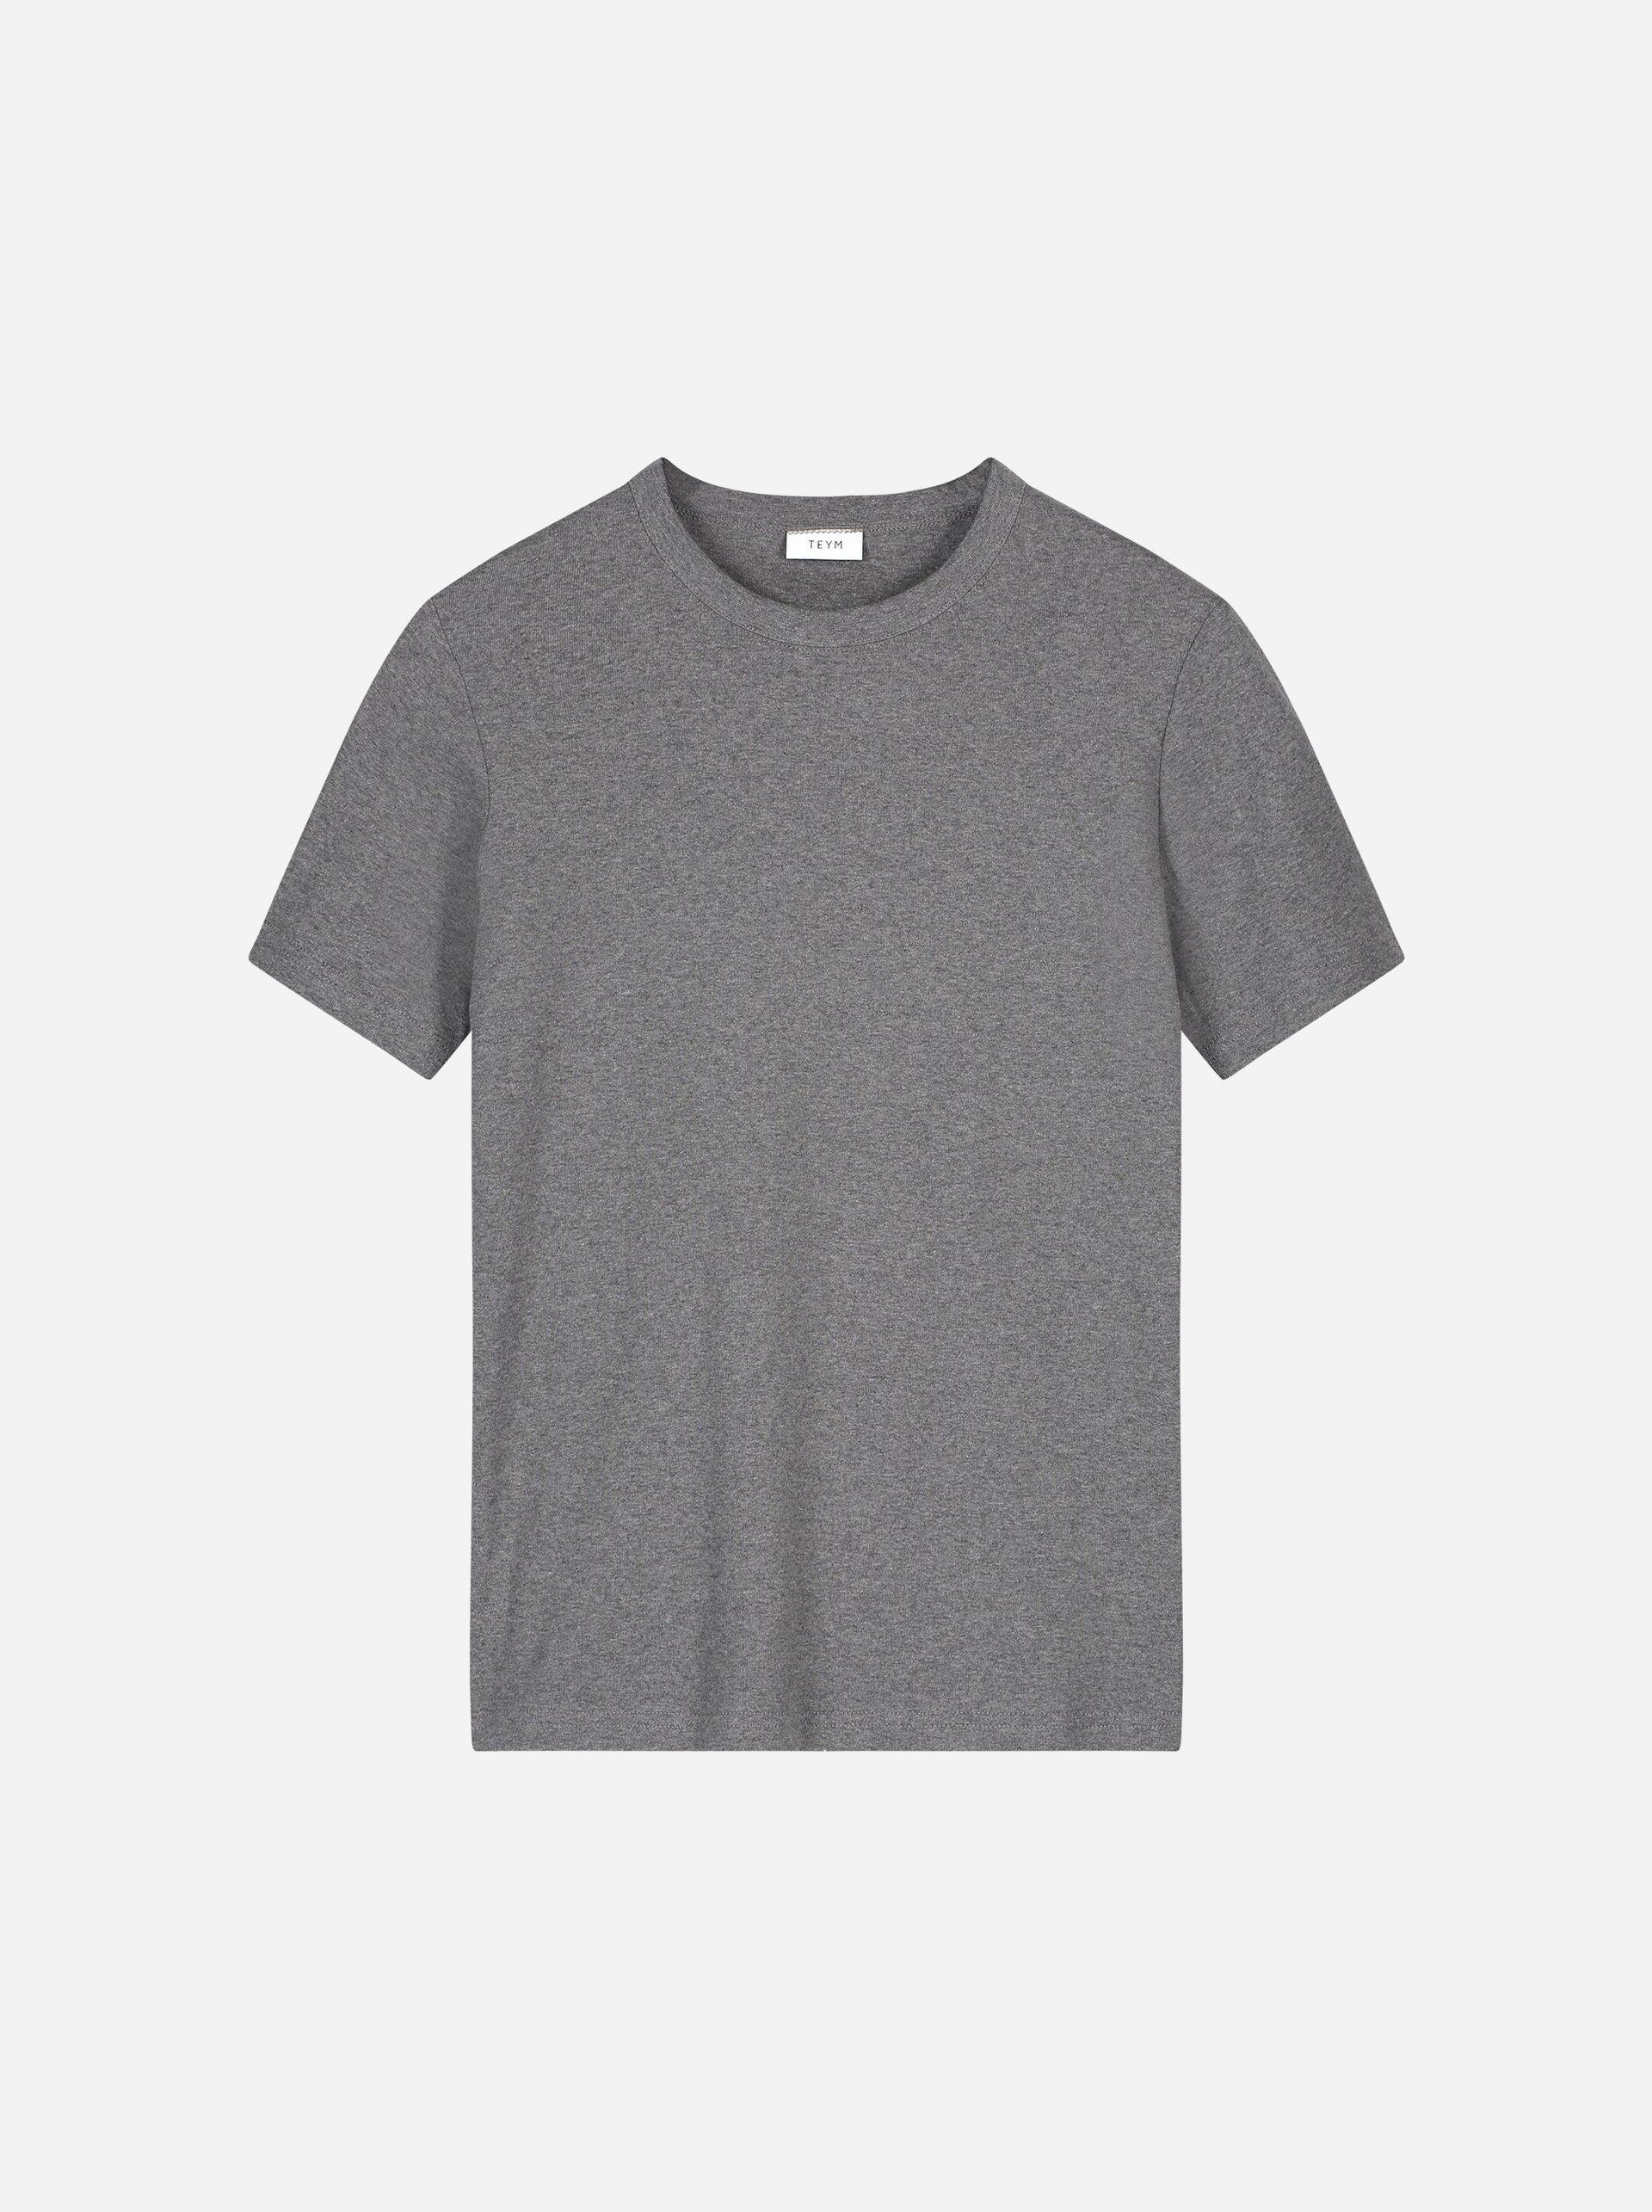 Teym - The T-Shirt - Women - Melange grey - 4B